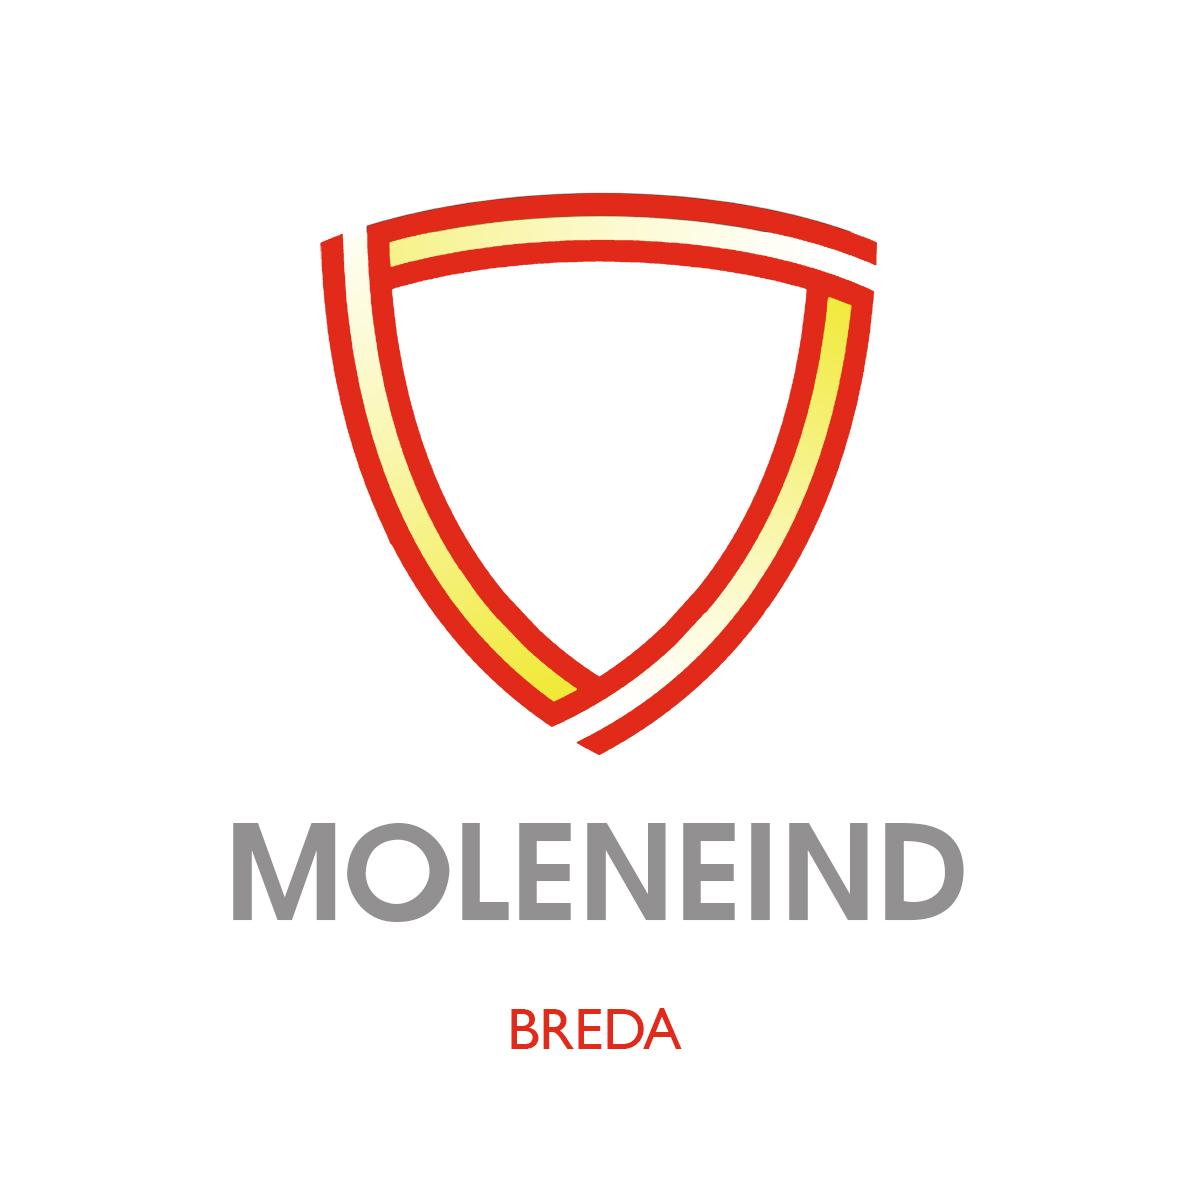 Moleneind-Breda